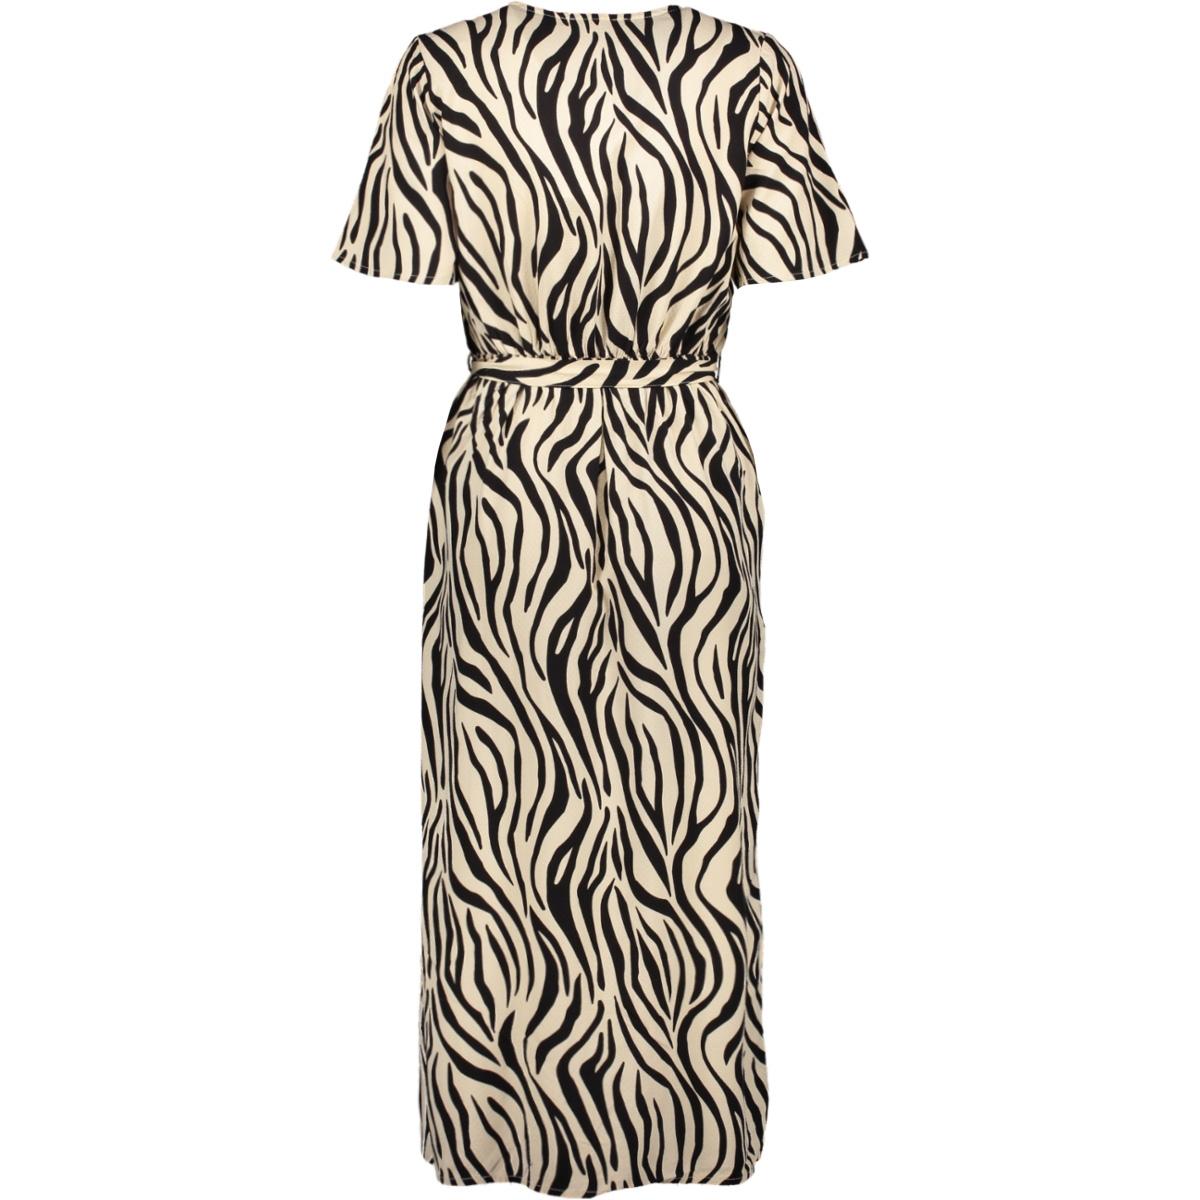 midi jurk met zebraprint p00282 garcia jurk 8832 sandshell